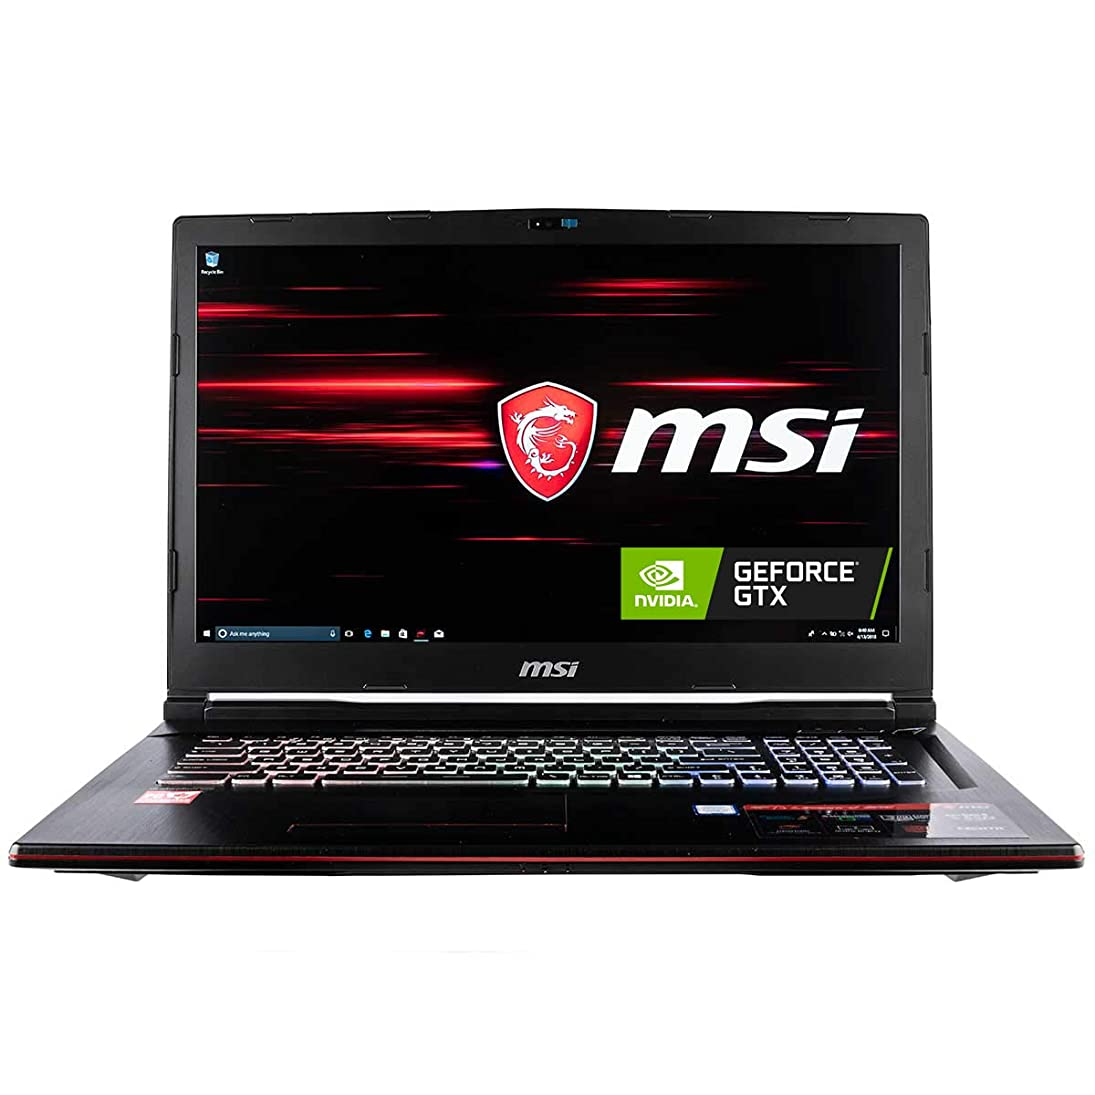 CUK MSI GP73 Leopard Gaming Laptop (8th Gen Intel Core i7-8750H, 32GB RAM, 1TB NVMe SSD + 1TB HDD, NVIDIA GeForce GTX 1060 6GB, 17.3